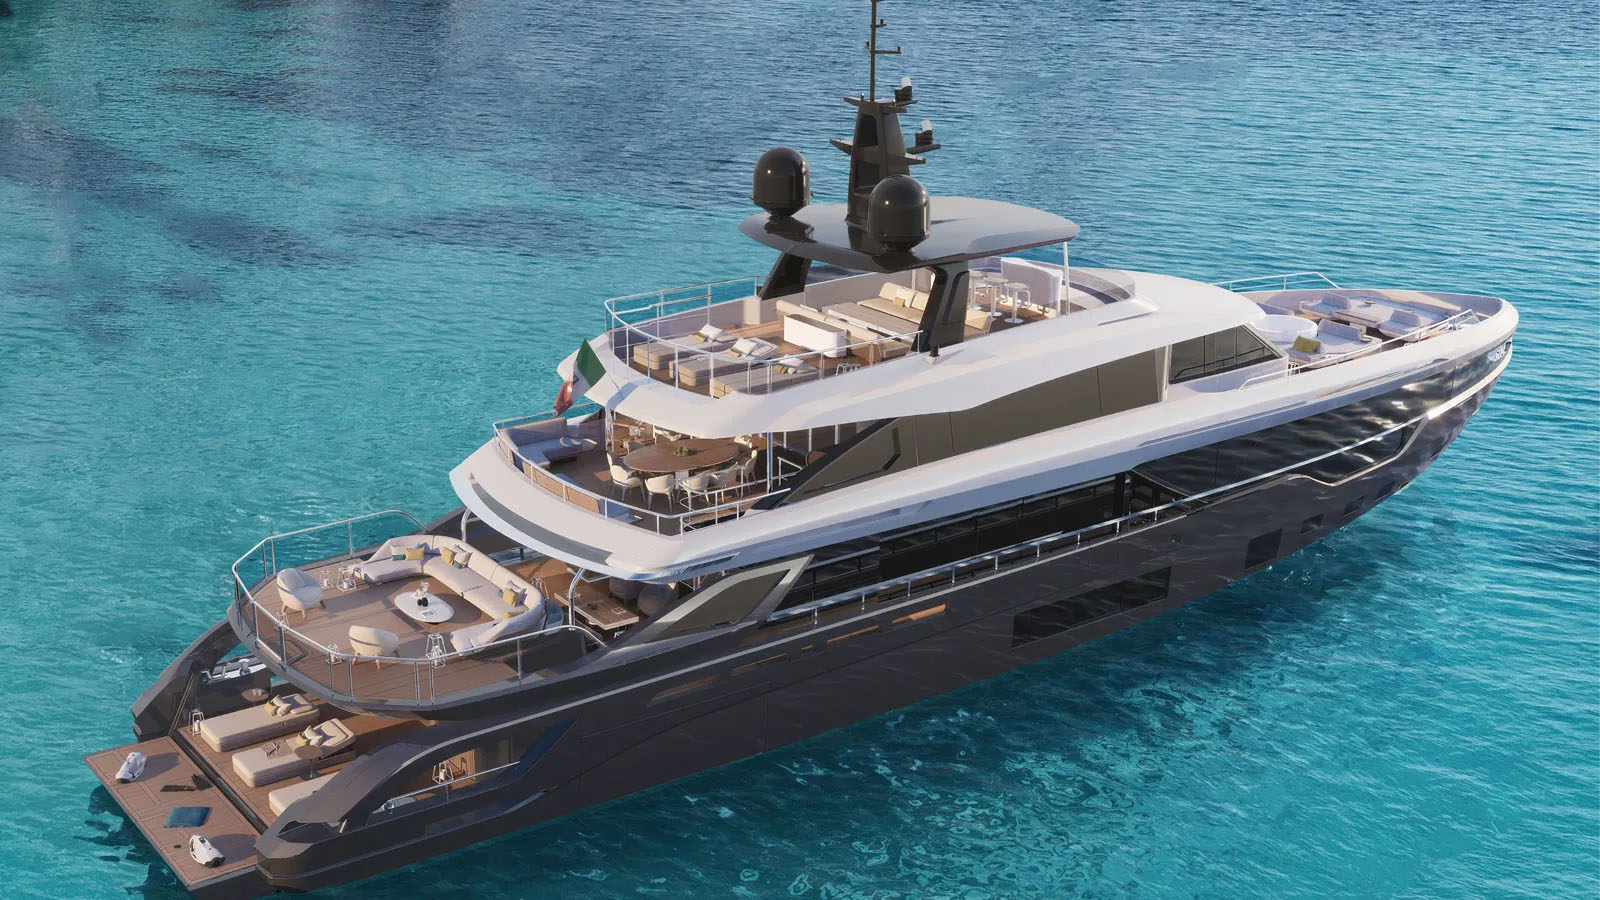 Siêu du thuyền Azimut TriDeck